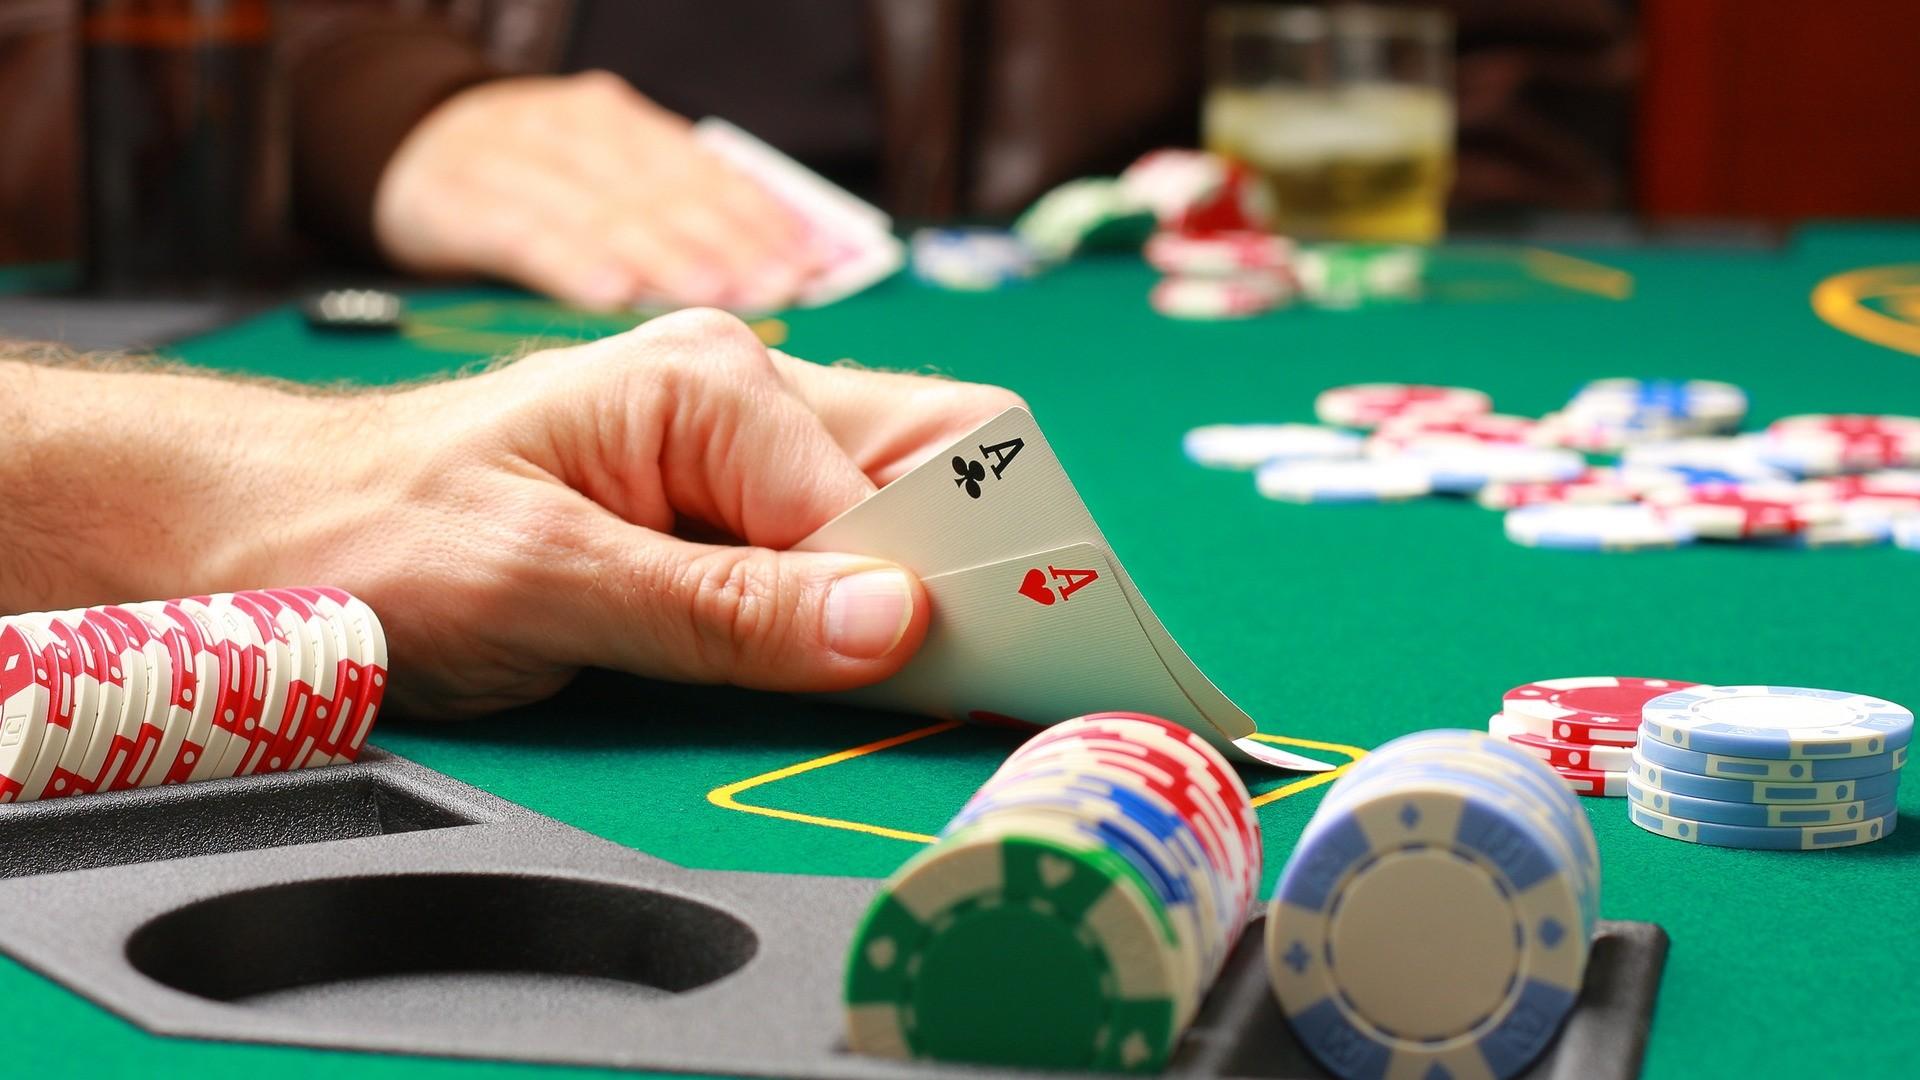 Hasil gambar untuk texas holdem poker